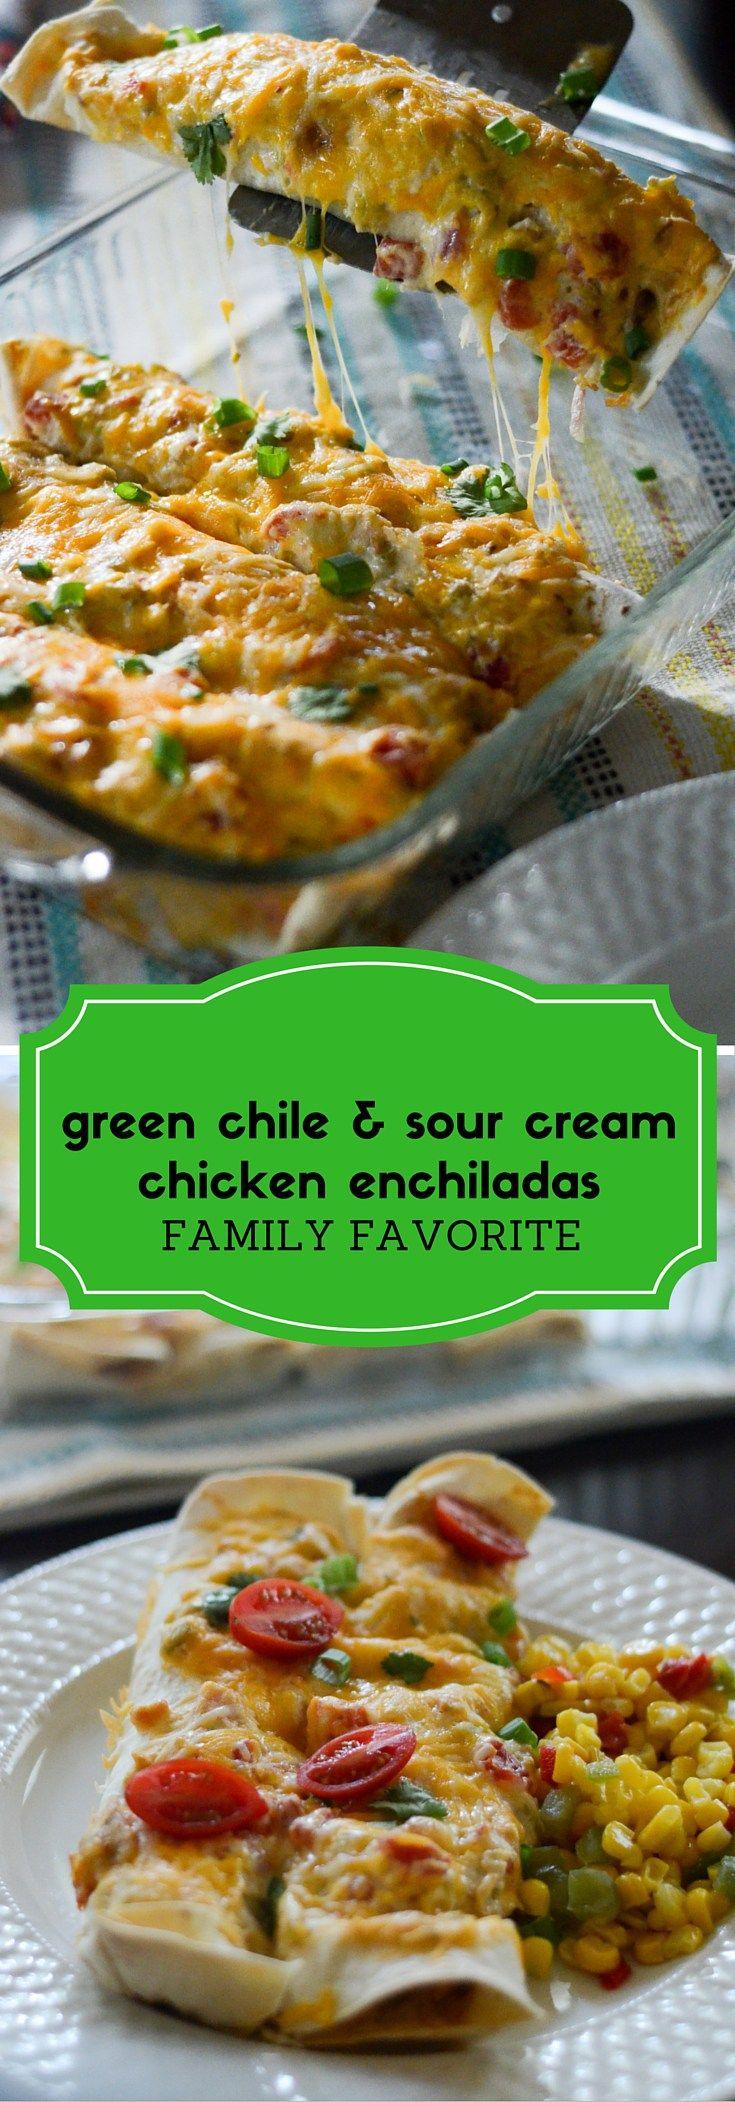 Green Chile Sour Cream Chicken Enchiladas - The Gifted Gabber